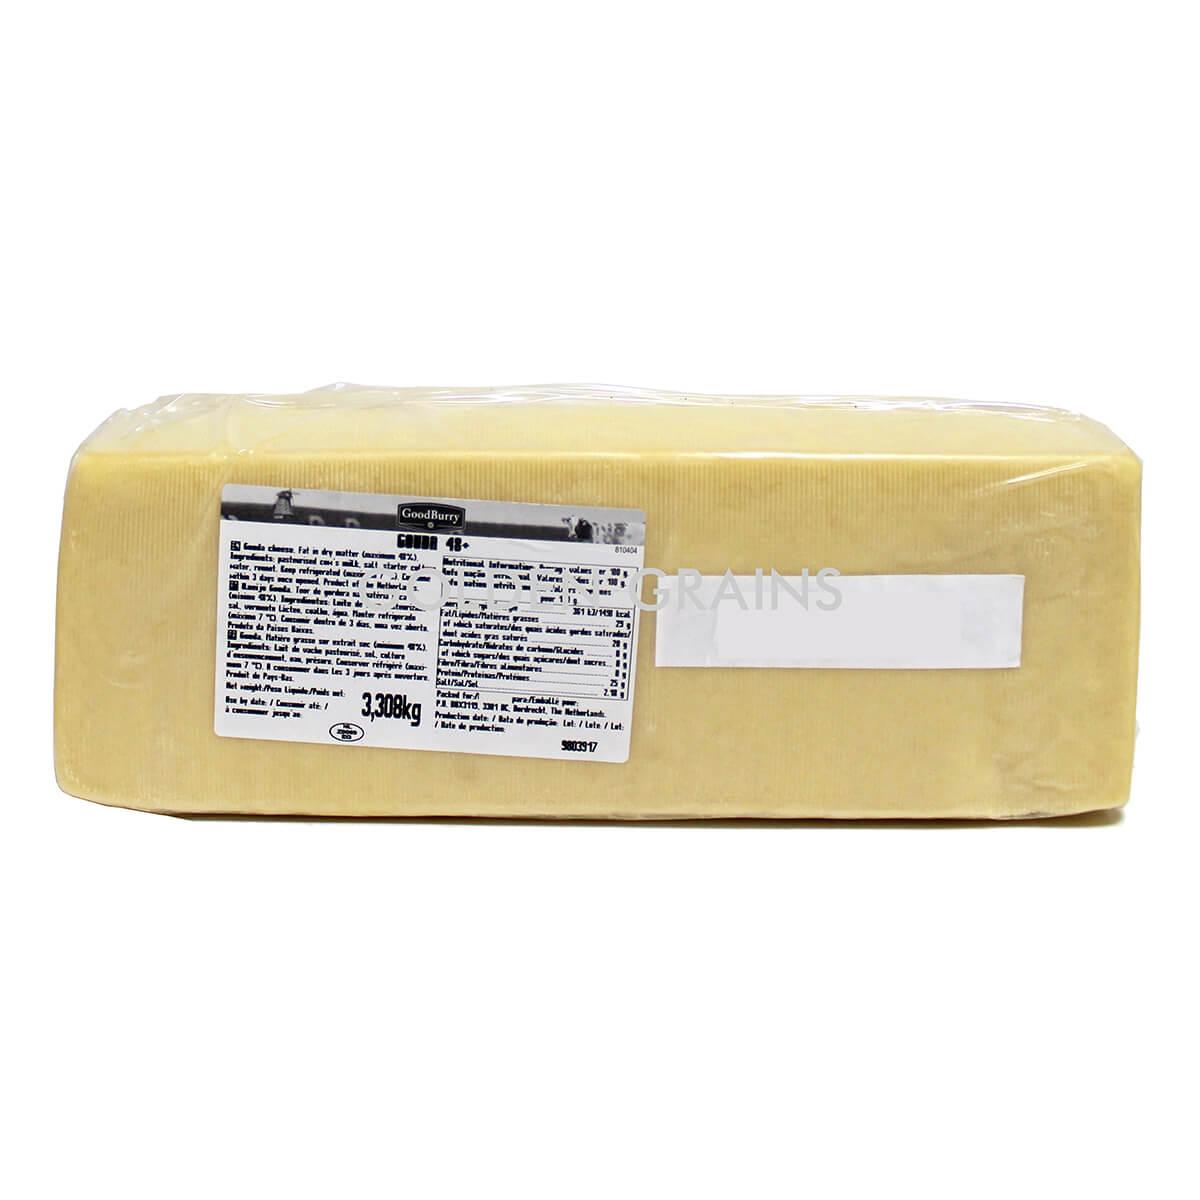 Goodbury Gouda Cheese Loaf